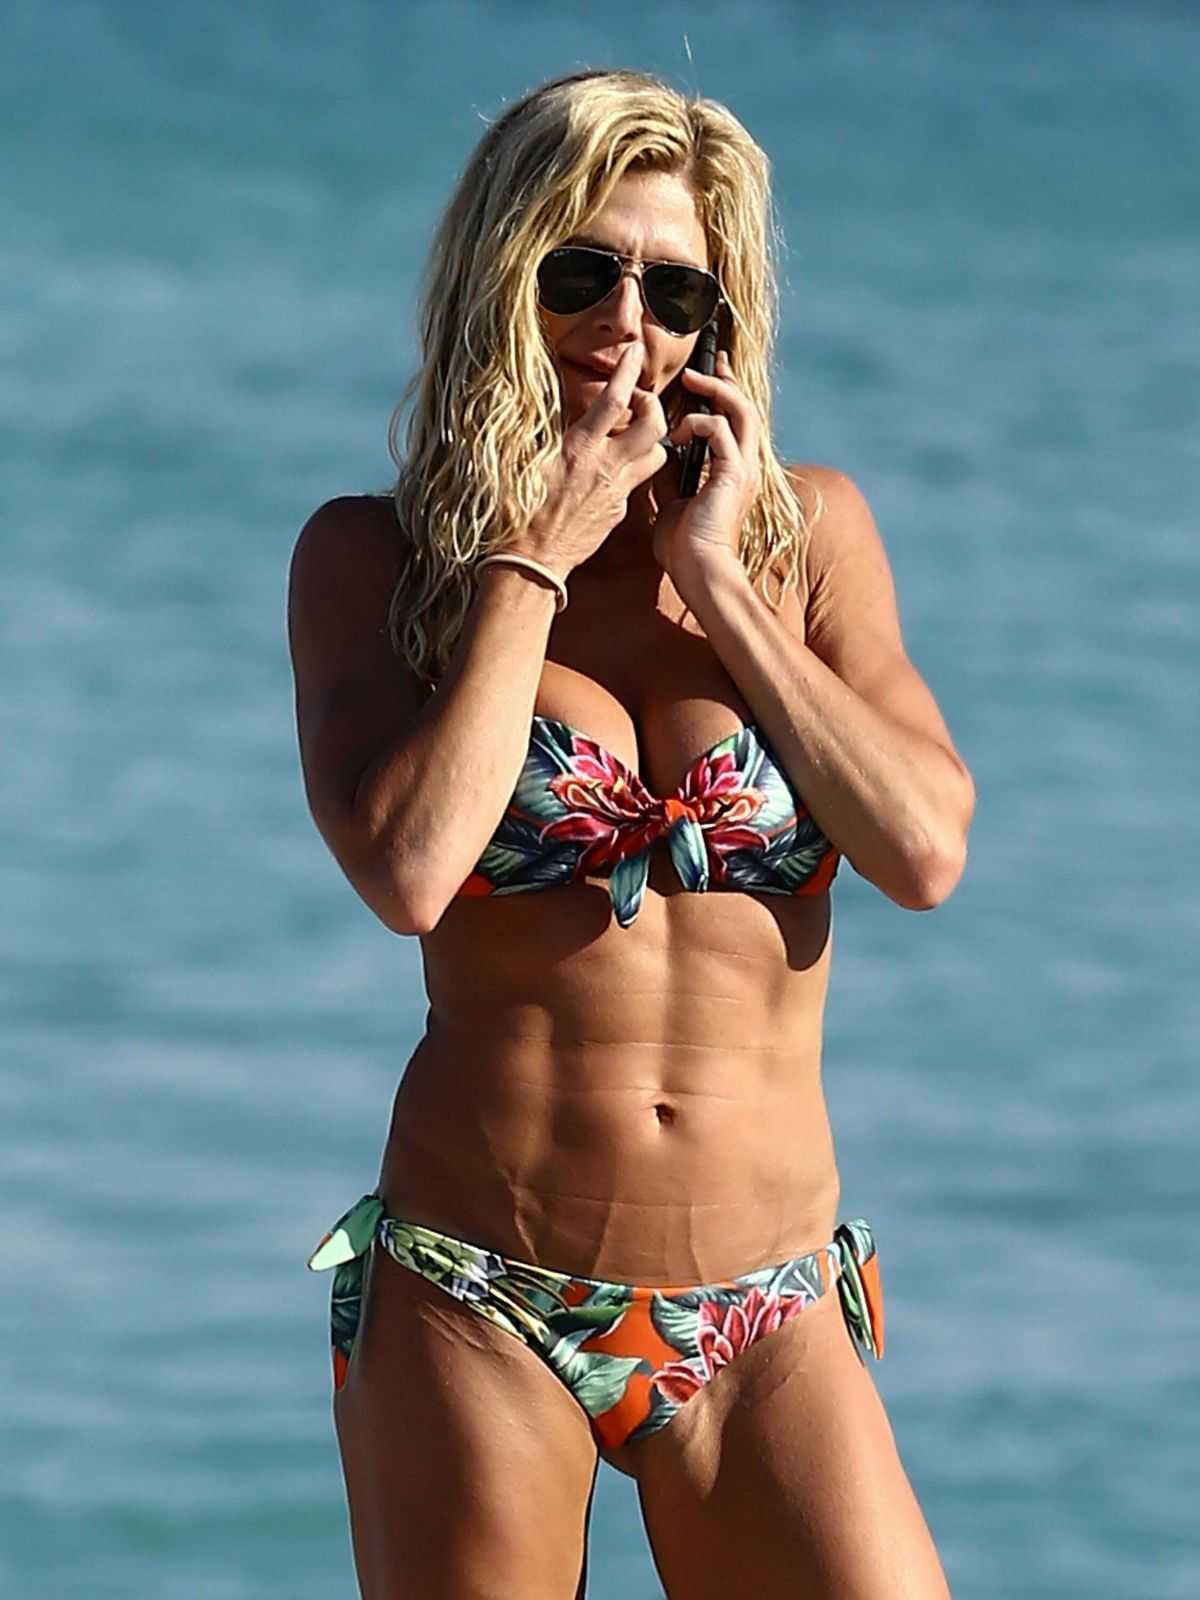 Beach The On 04072017 Torrie In Bikini Miami Wilson nOPX0N8kw